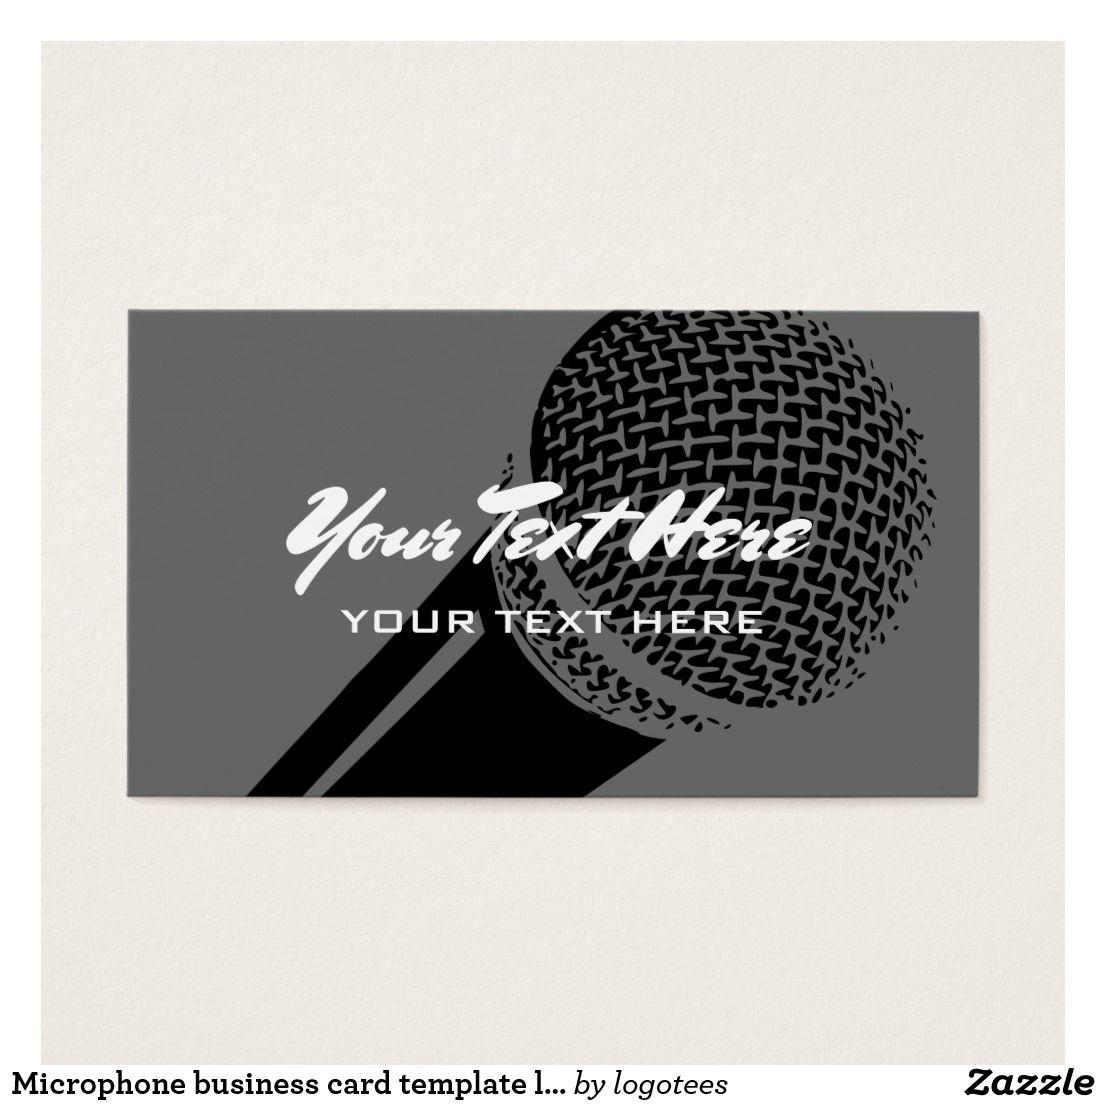 Microphone business card template logo design | Card templates ...